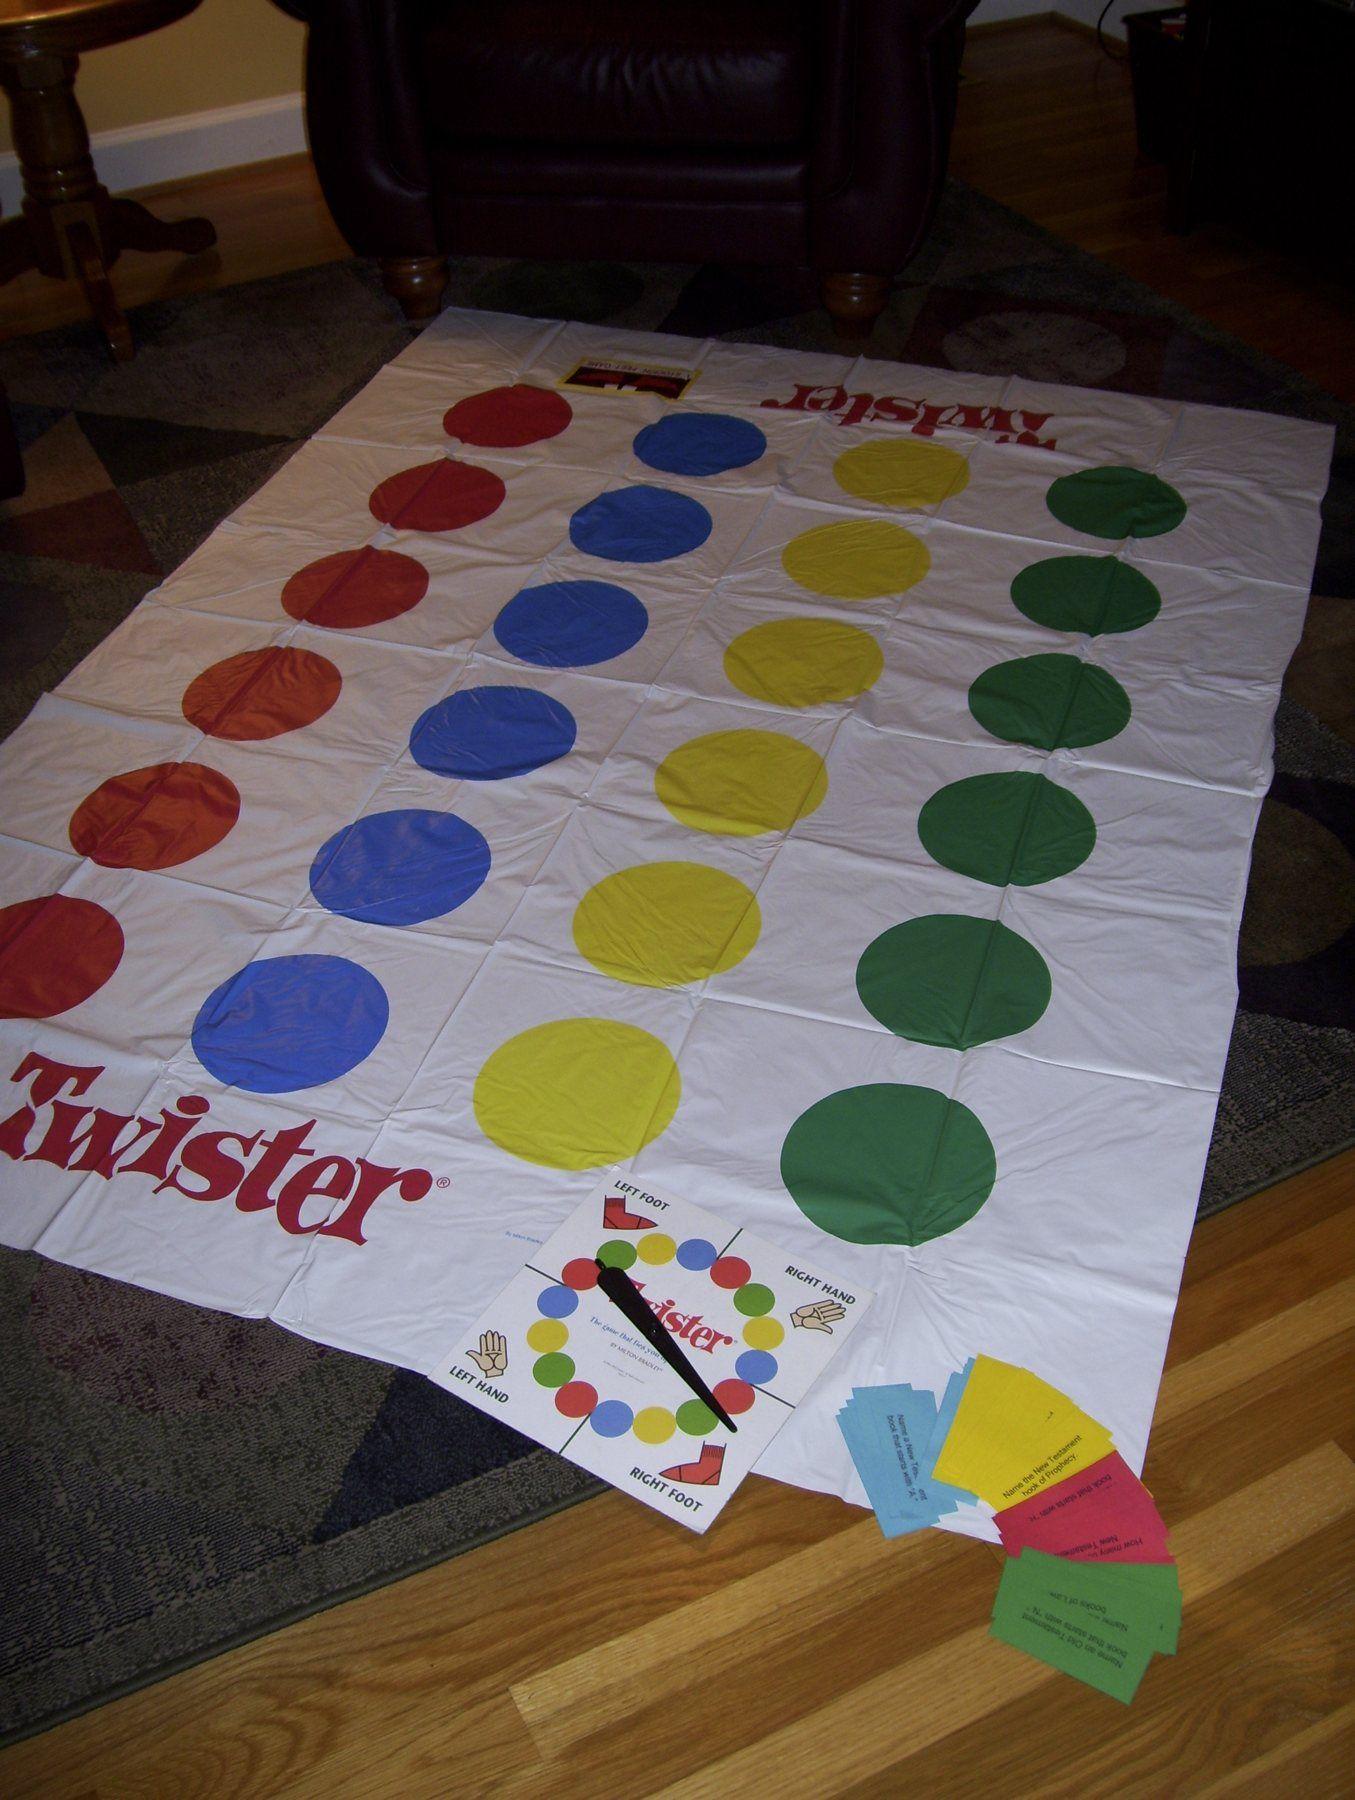 Fun English games for kids | LearnEnglish Kids - British ...